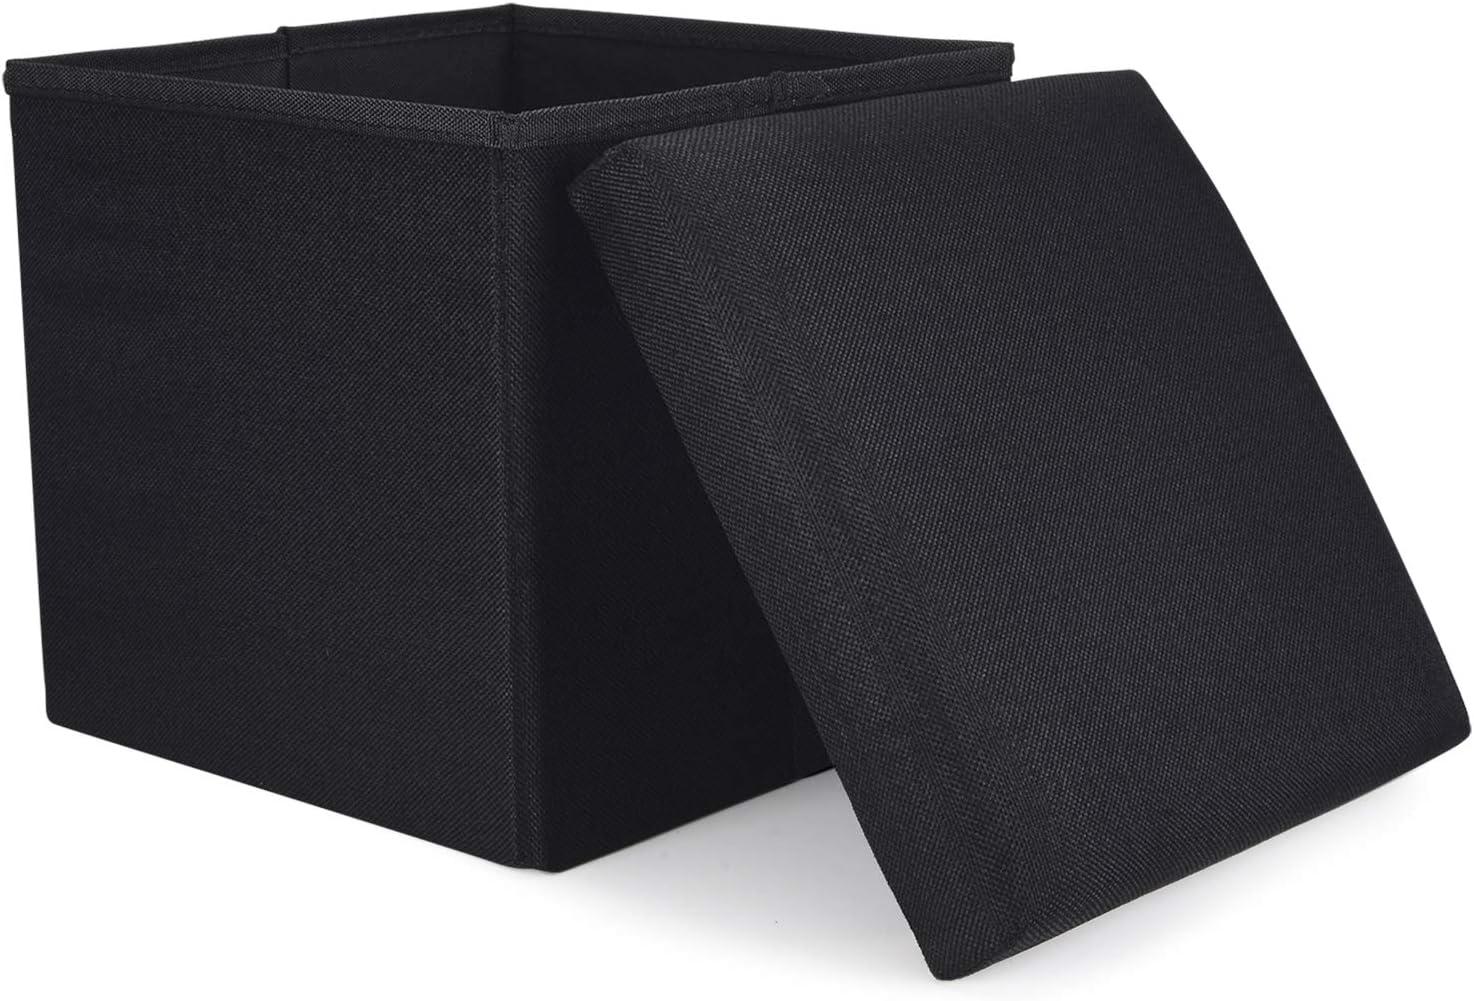 WoneNice Folding Storage Ottoman, Versatile Space-Saving Storage Toy Box with Memory Foam Seat, Max Load 100 kg Linen Black 12 x 12 x 12 Inch